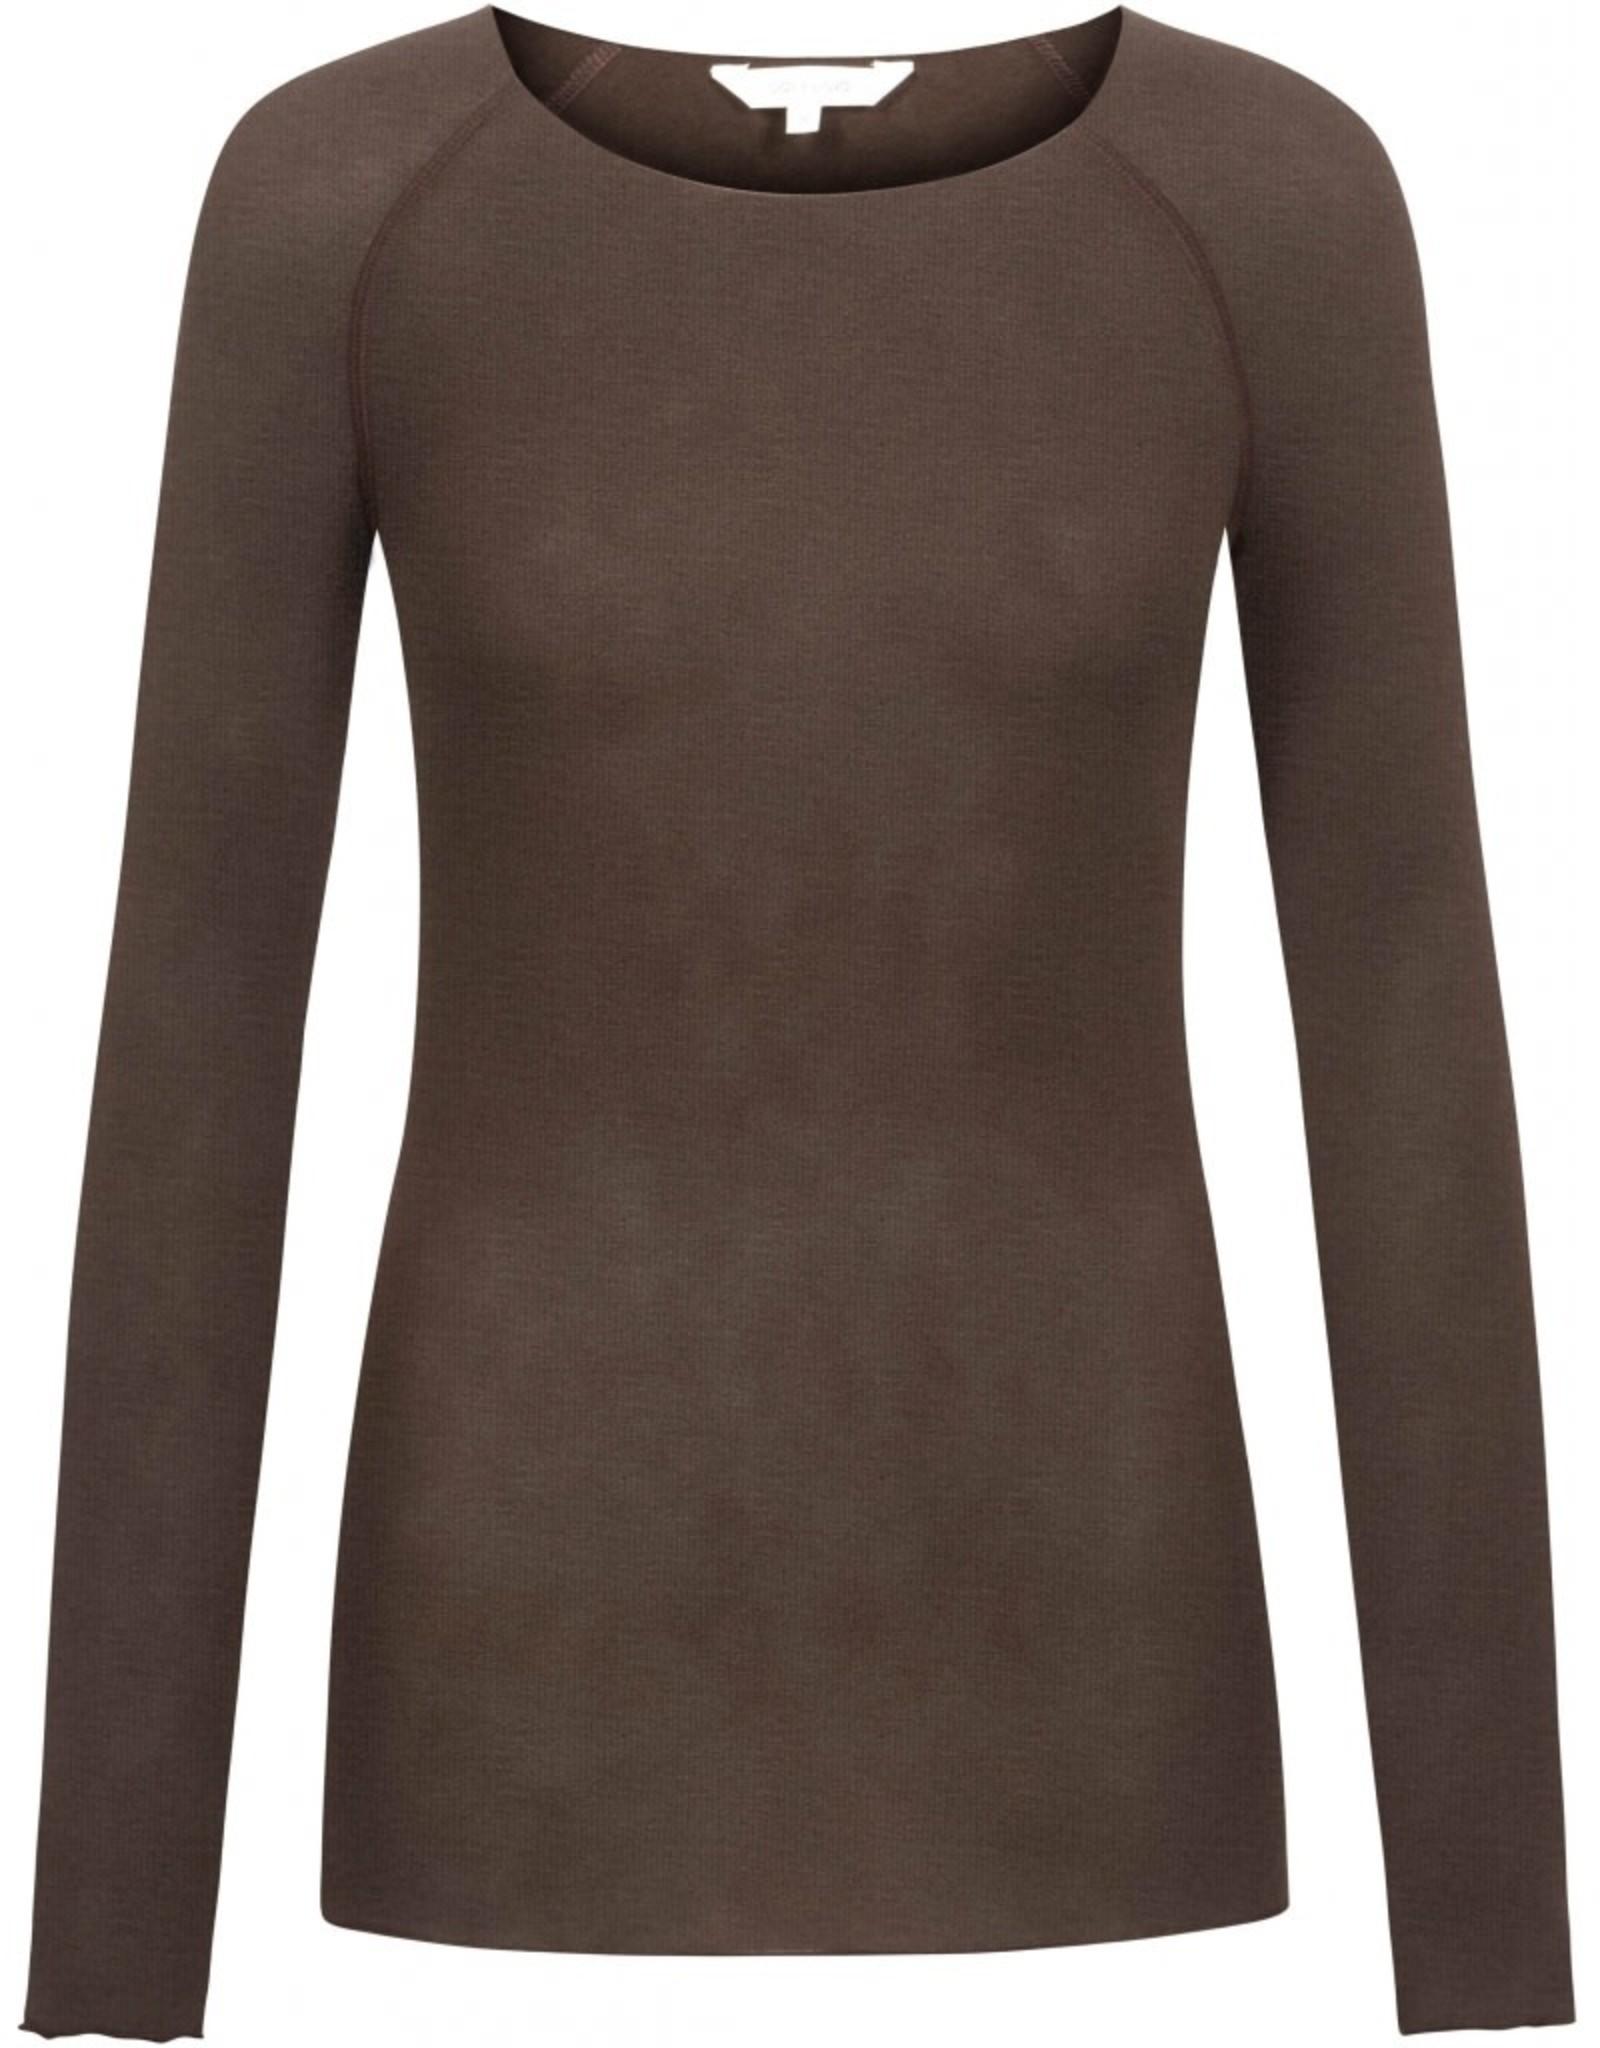 Gai&Lisva Amalie shirt wol/viscose Coffee Bean